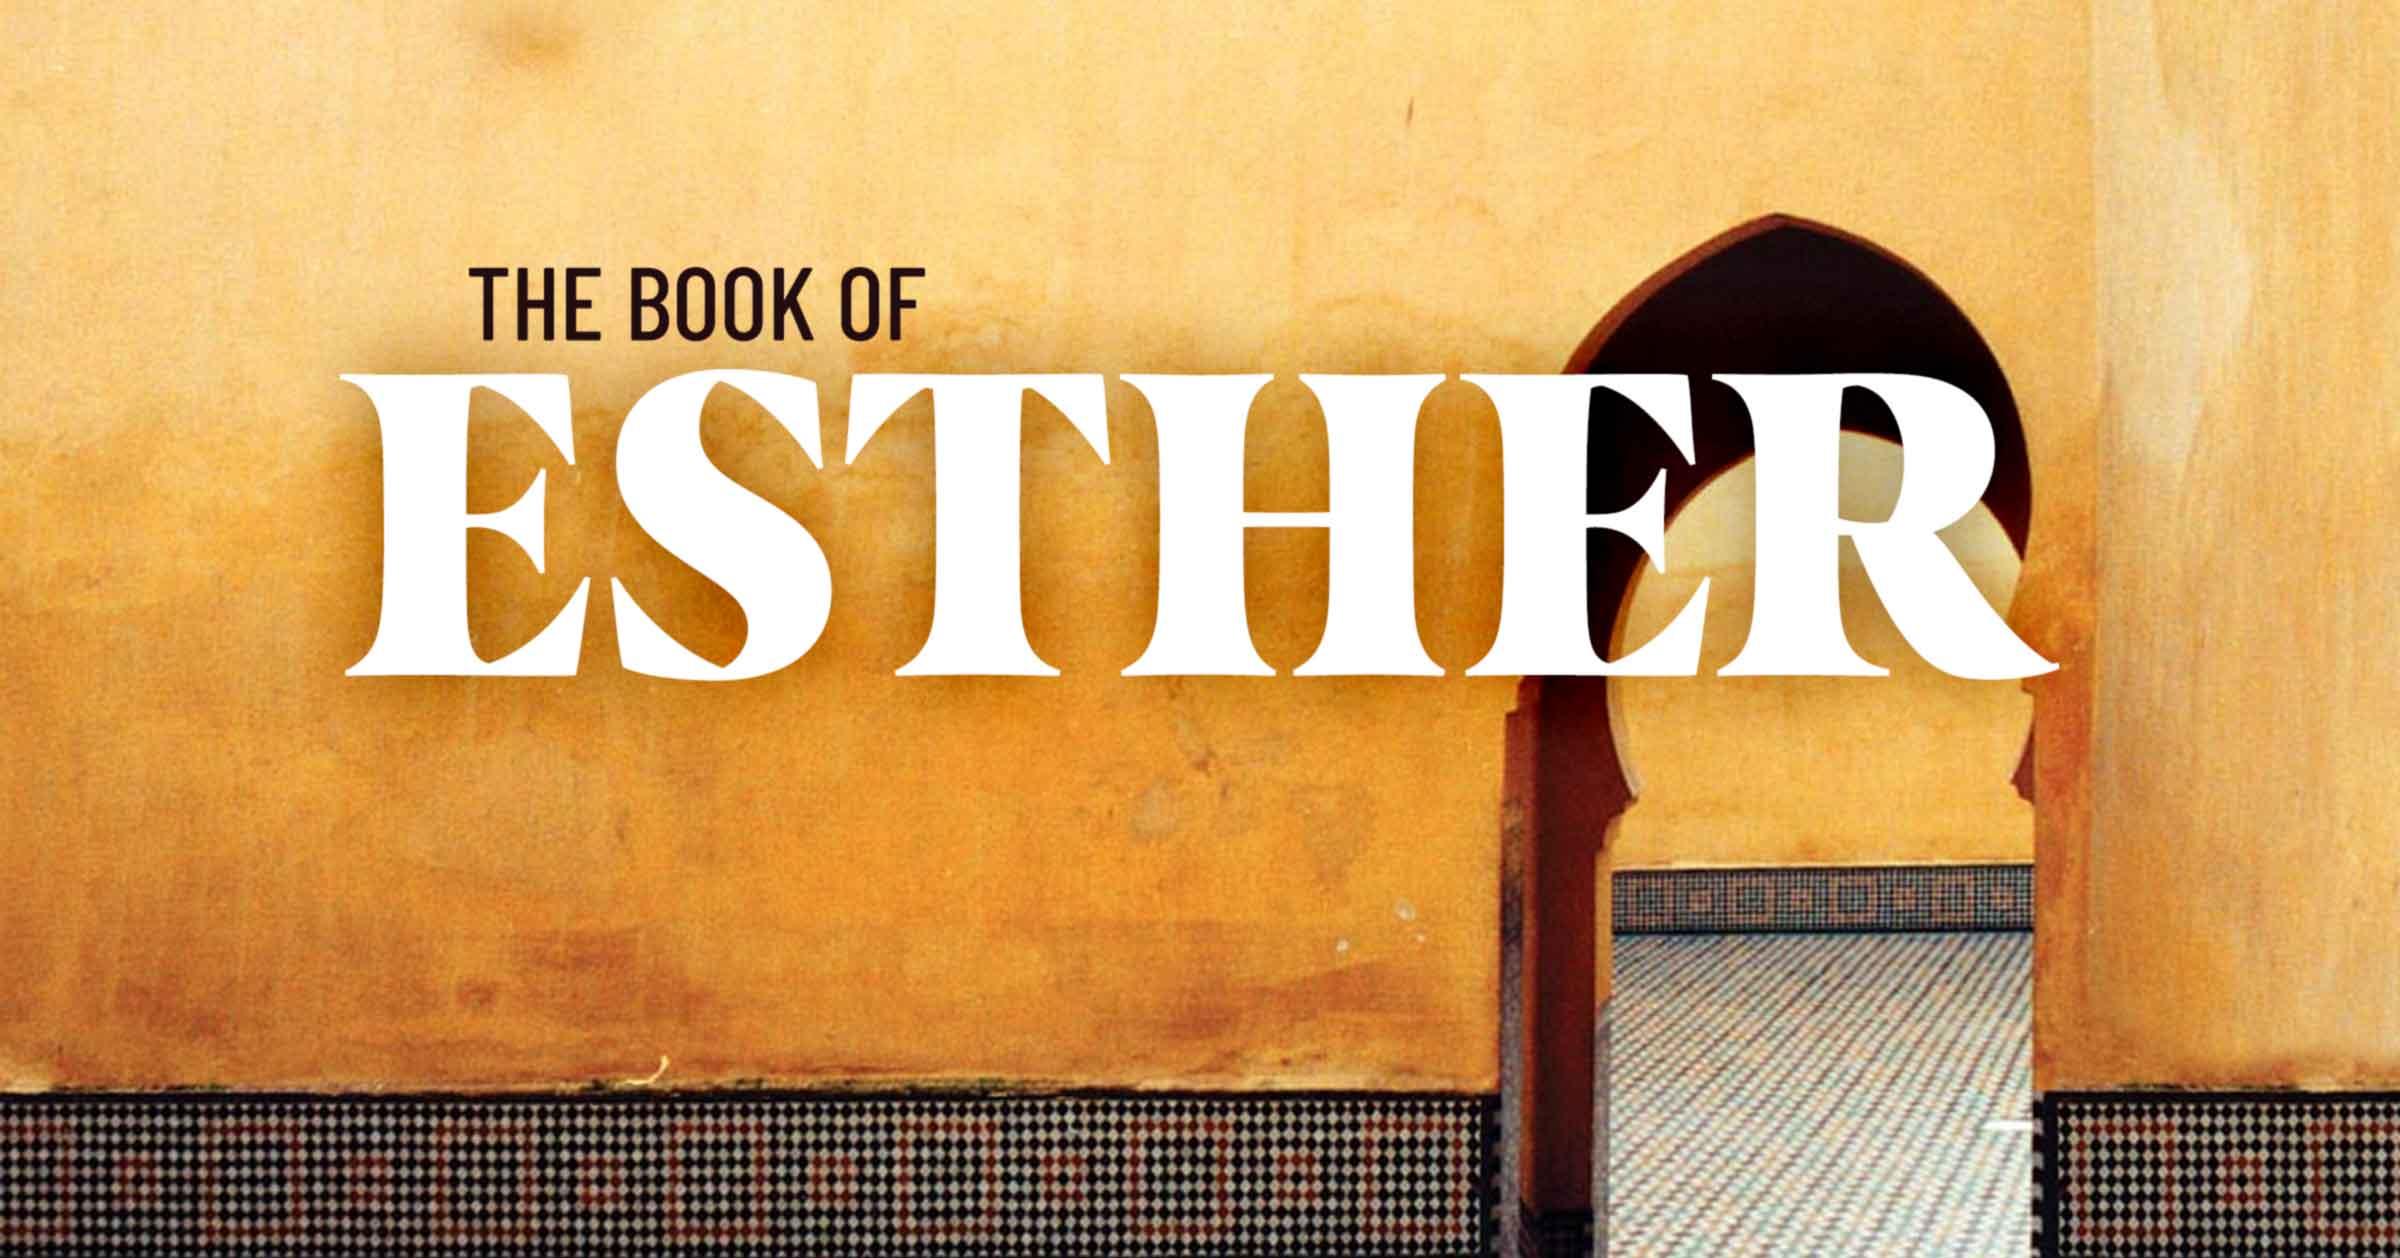 PV Bible Church -- Book of Esther sermon series alt